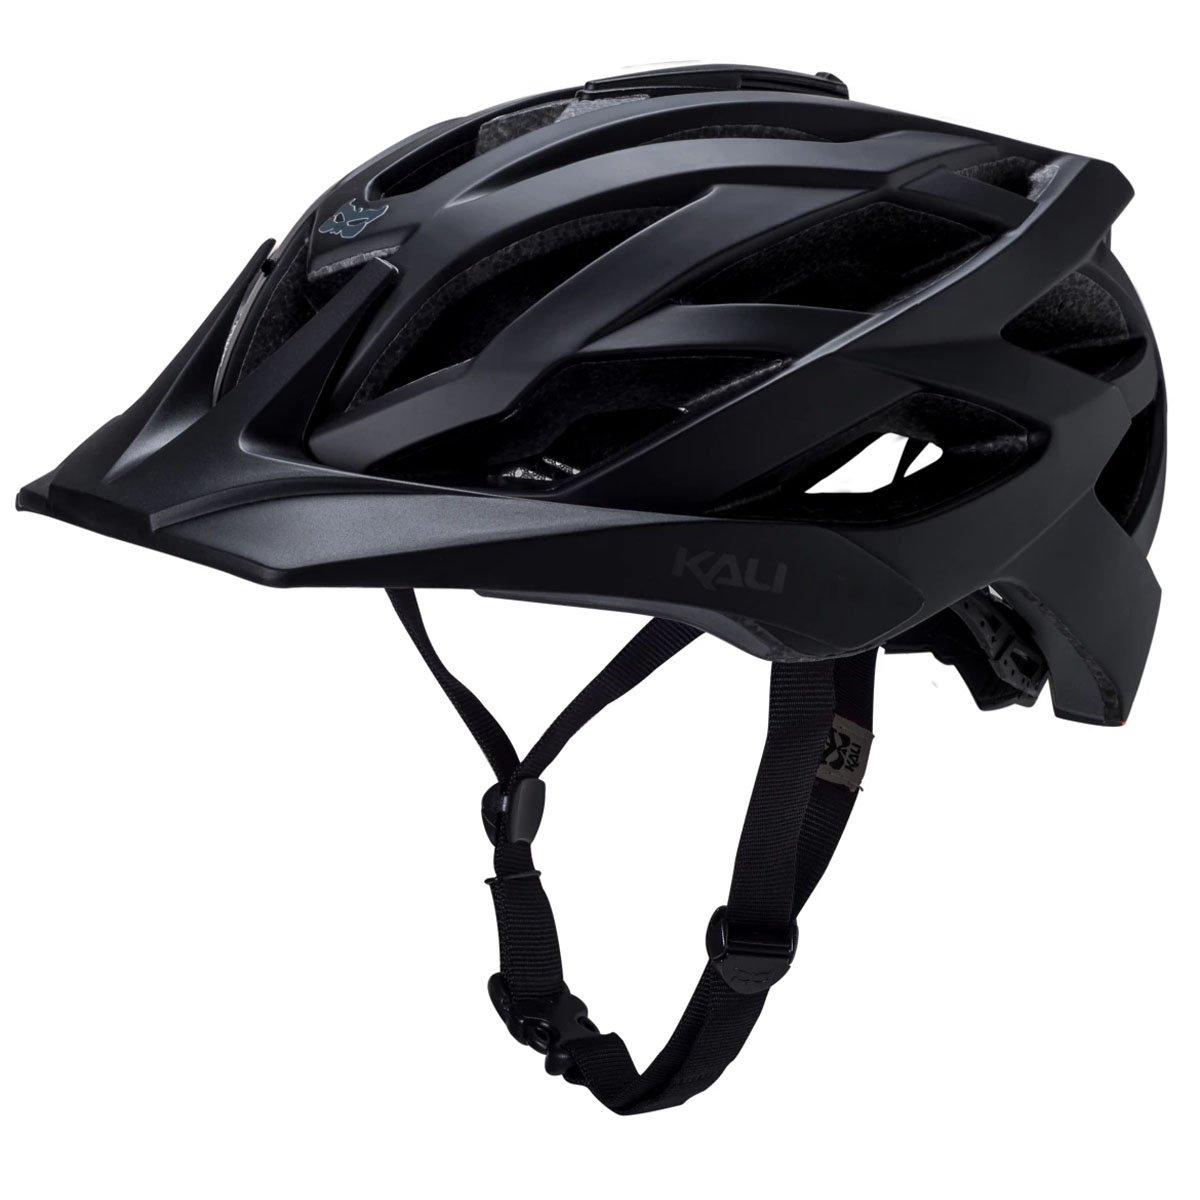 Kali Lunati - Casco de Bicicleta - Negro Contorno de la ...